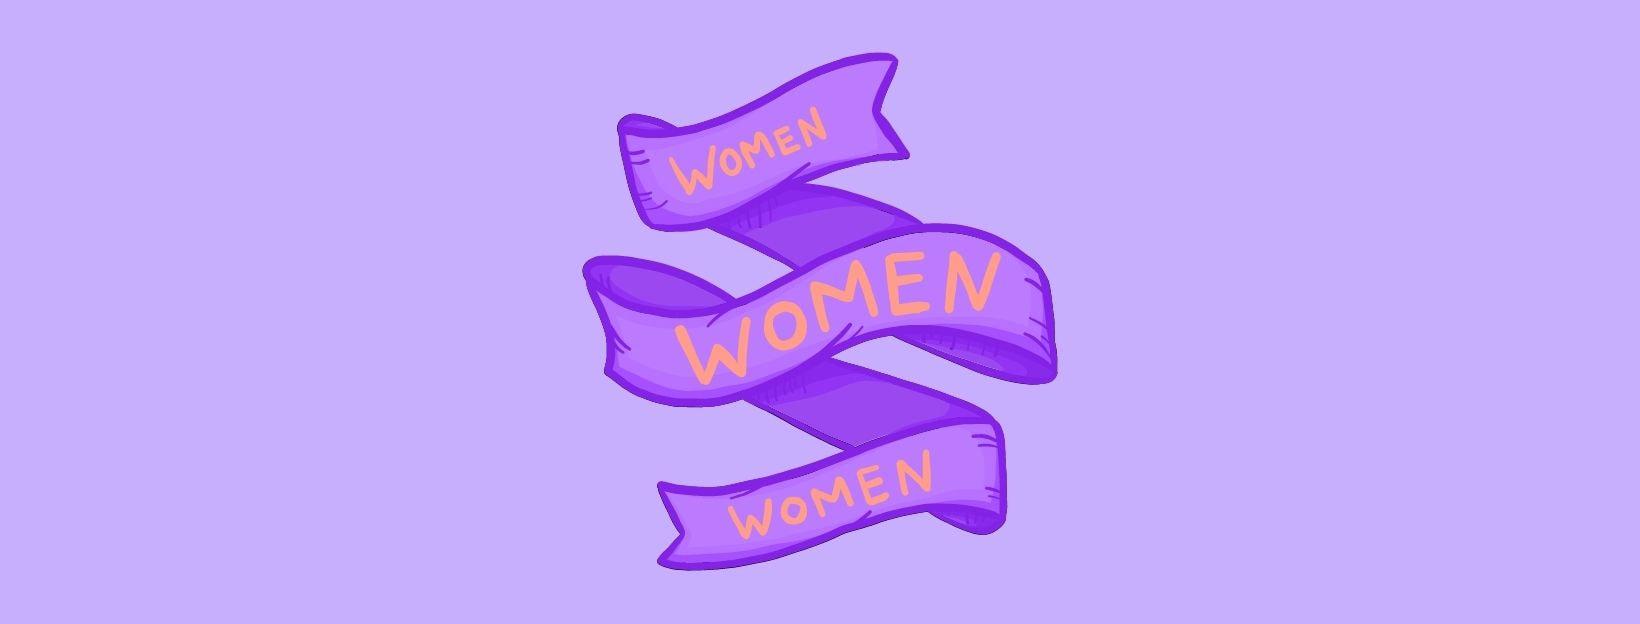 BANNER-Canva-Orange and Purple Banner International Women's Day Instagram Post